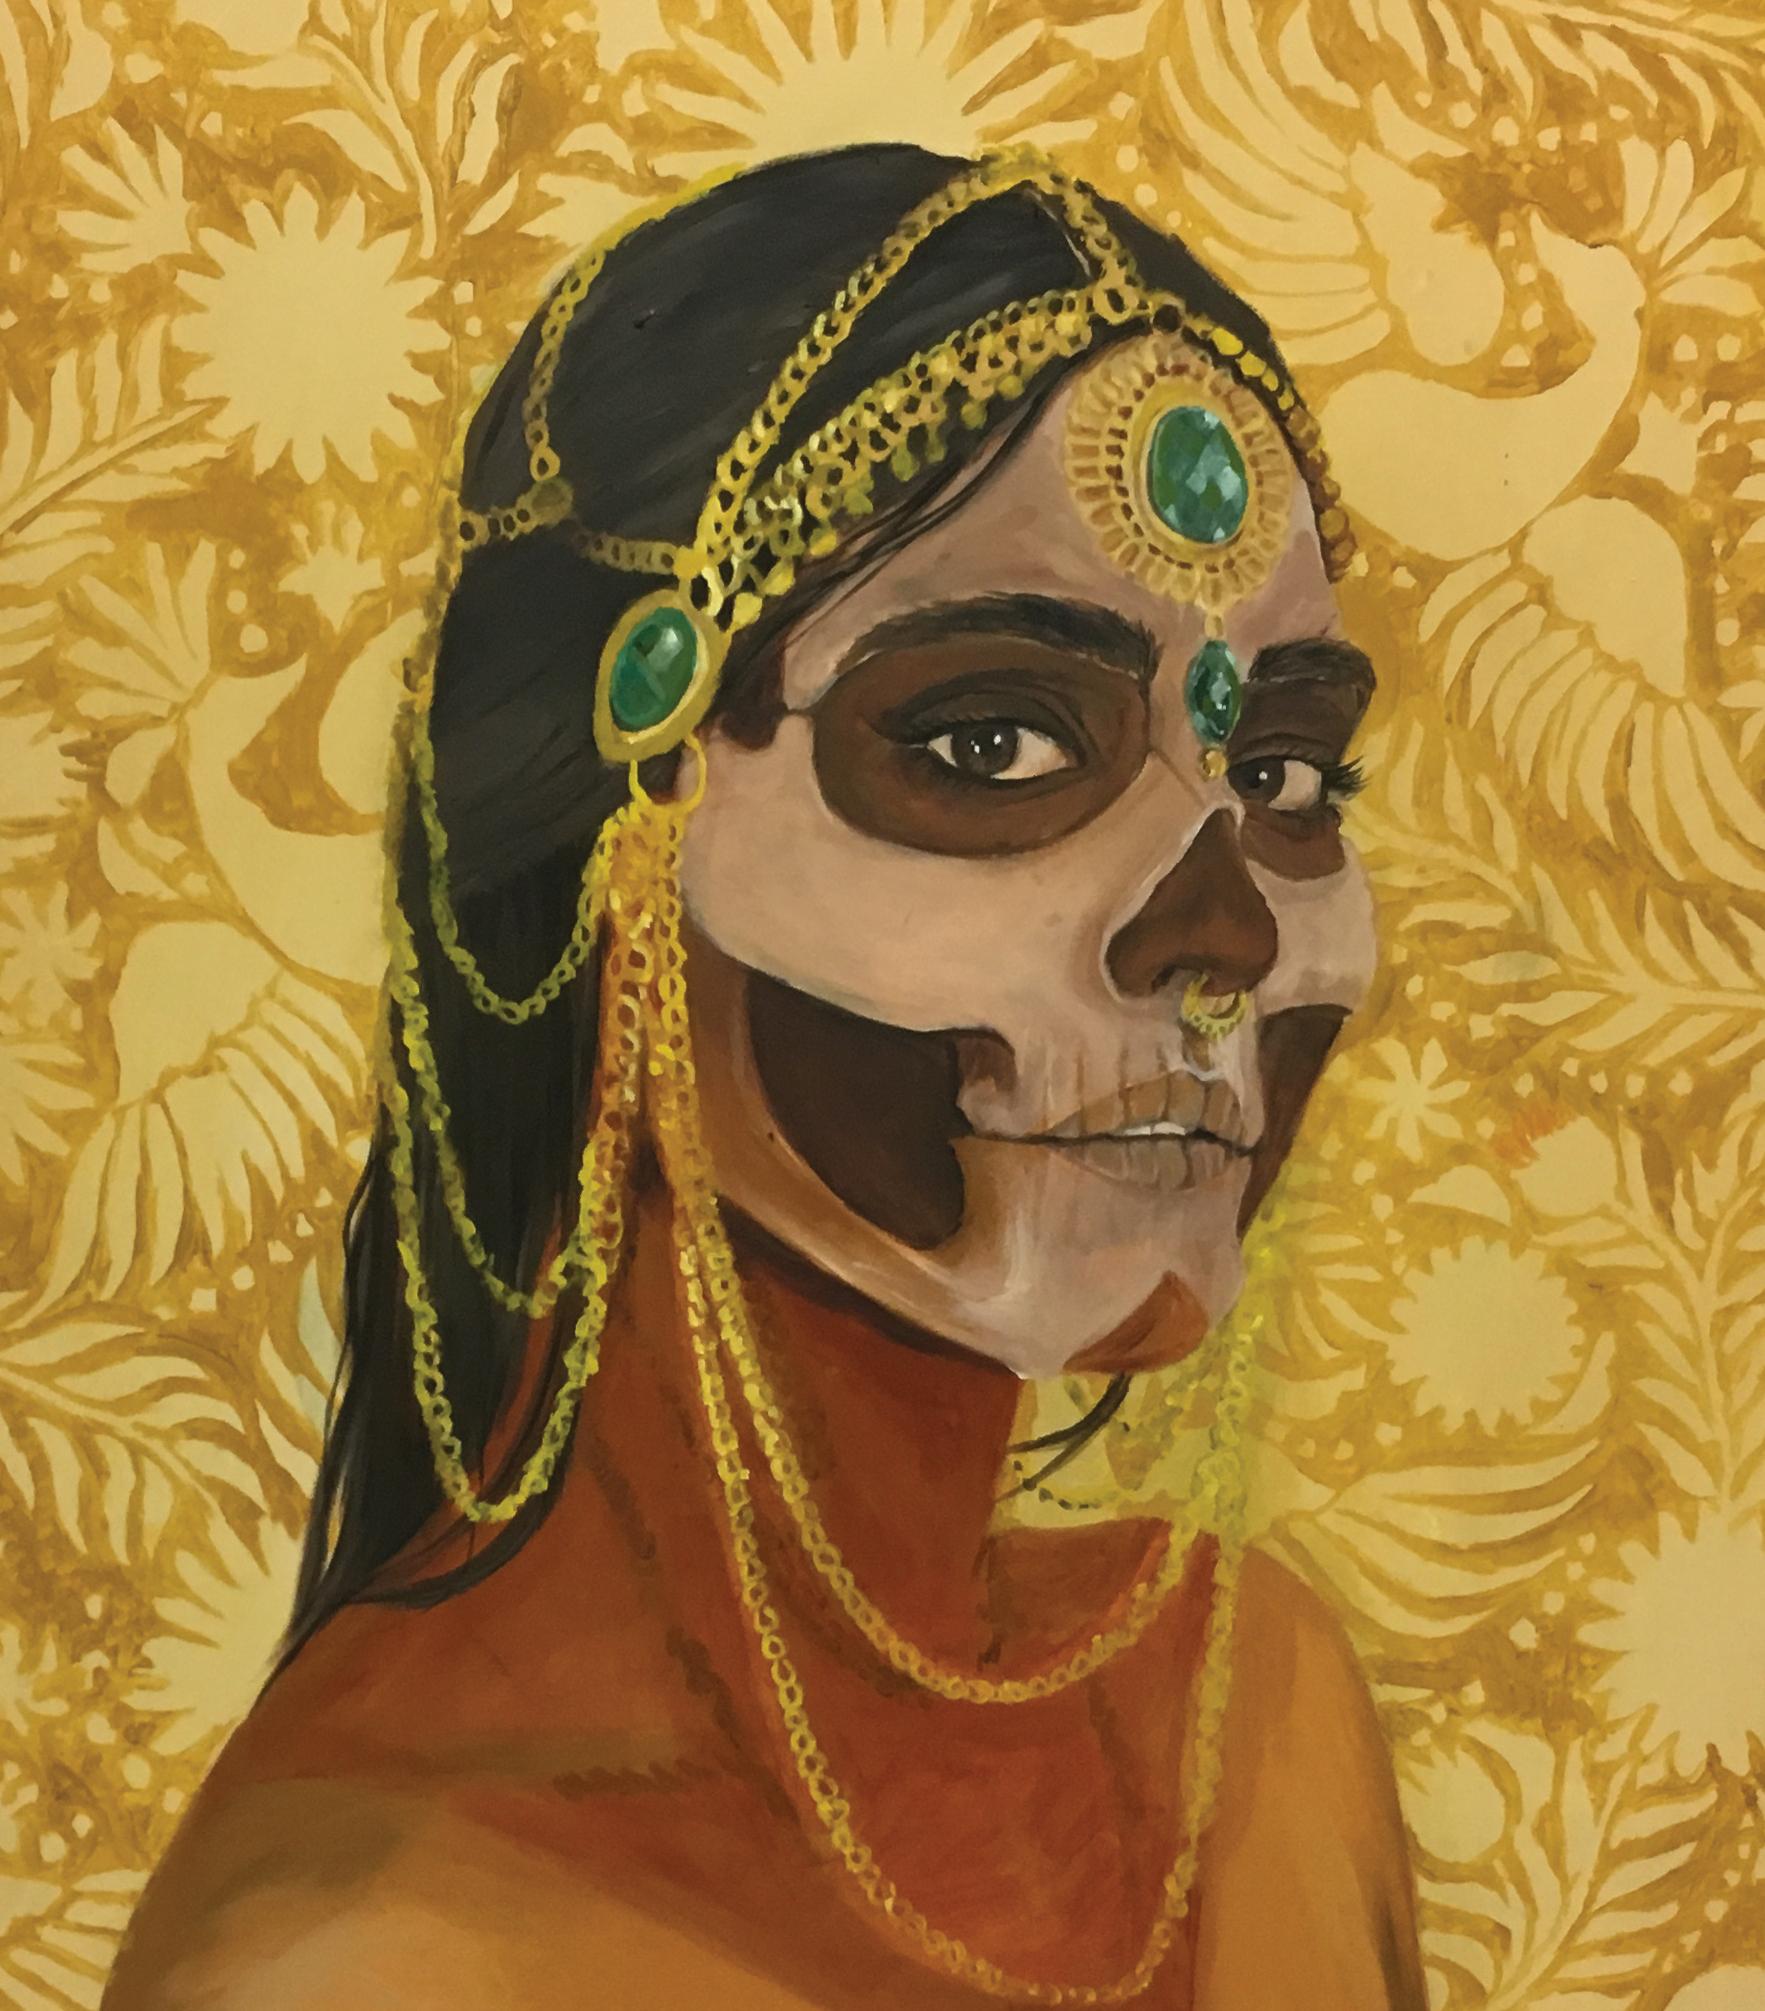 Alysha by Michael Esparza